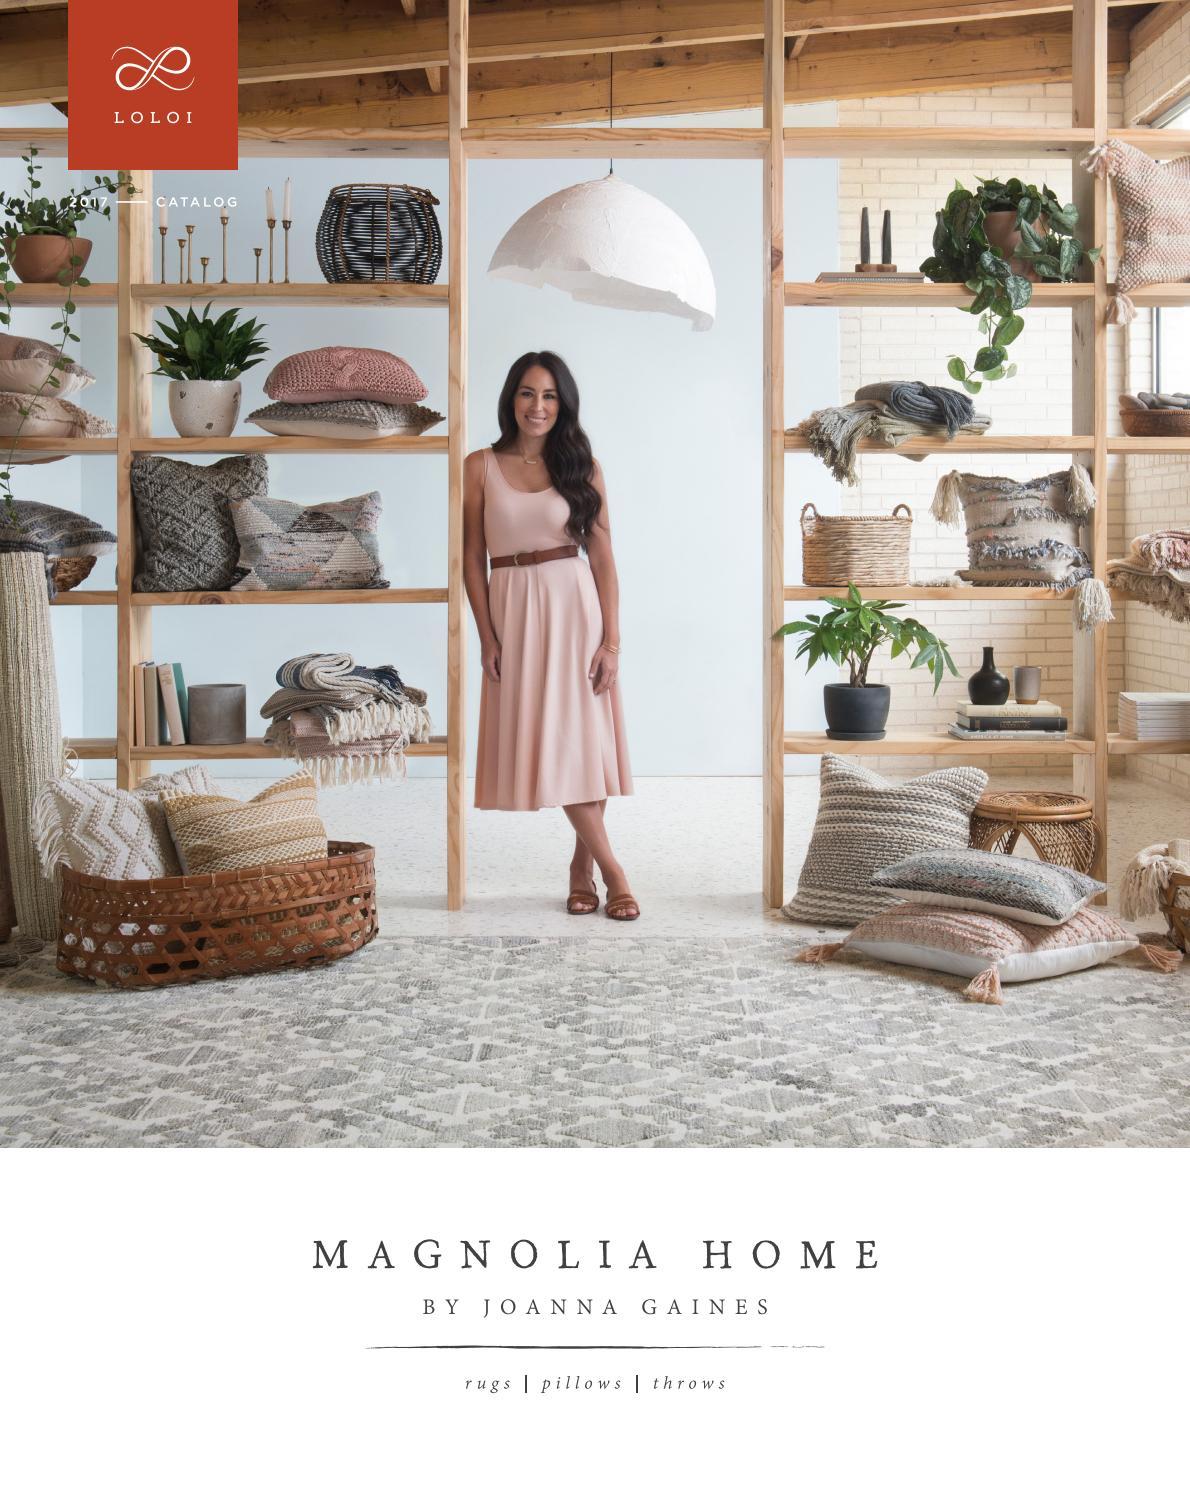 loloi magnolia home catalog 2017 by